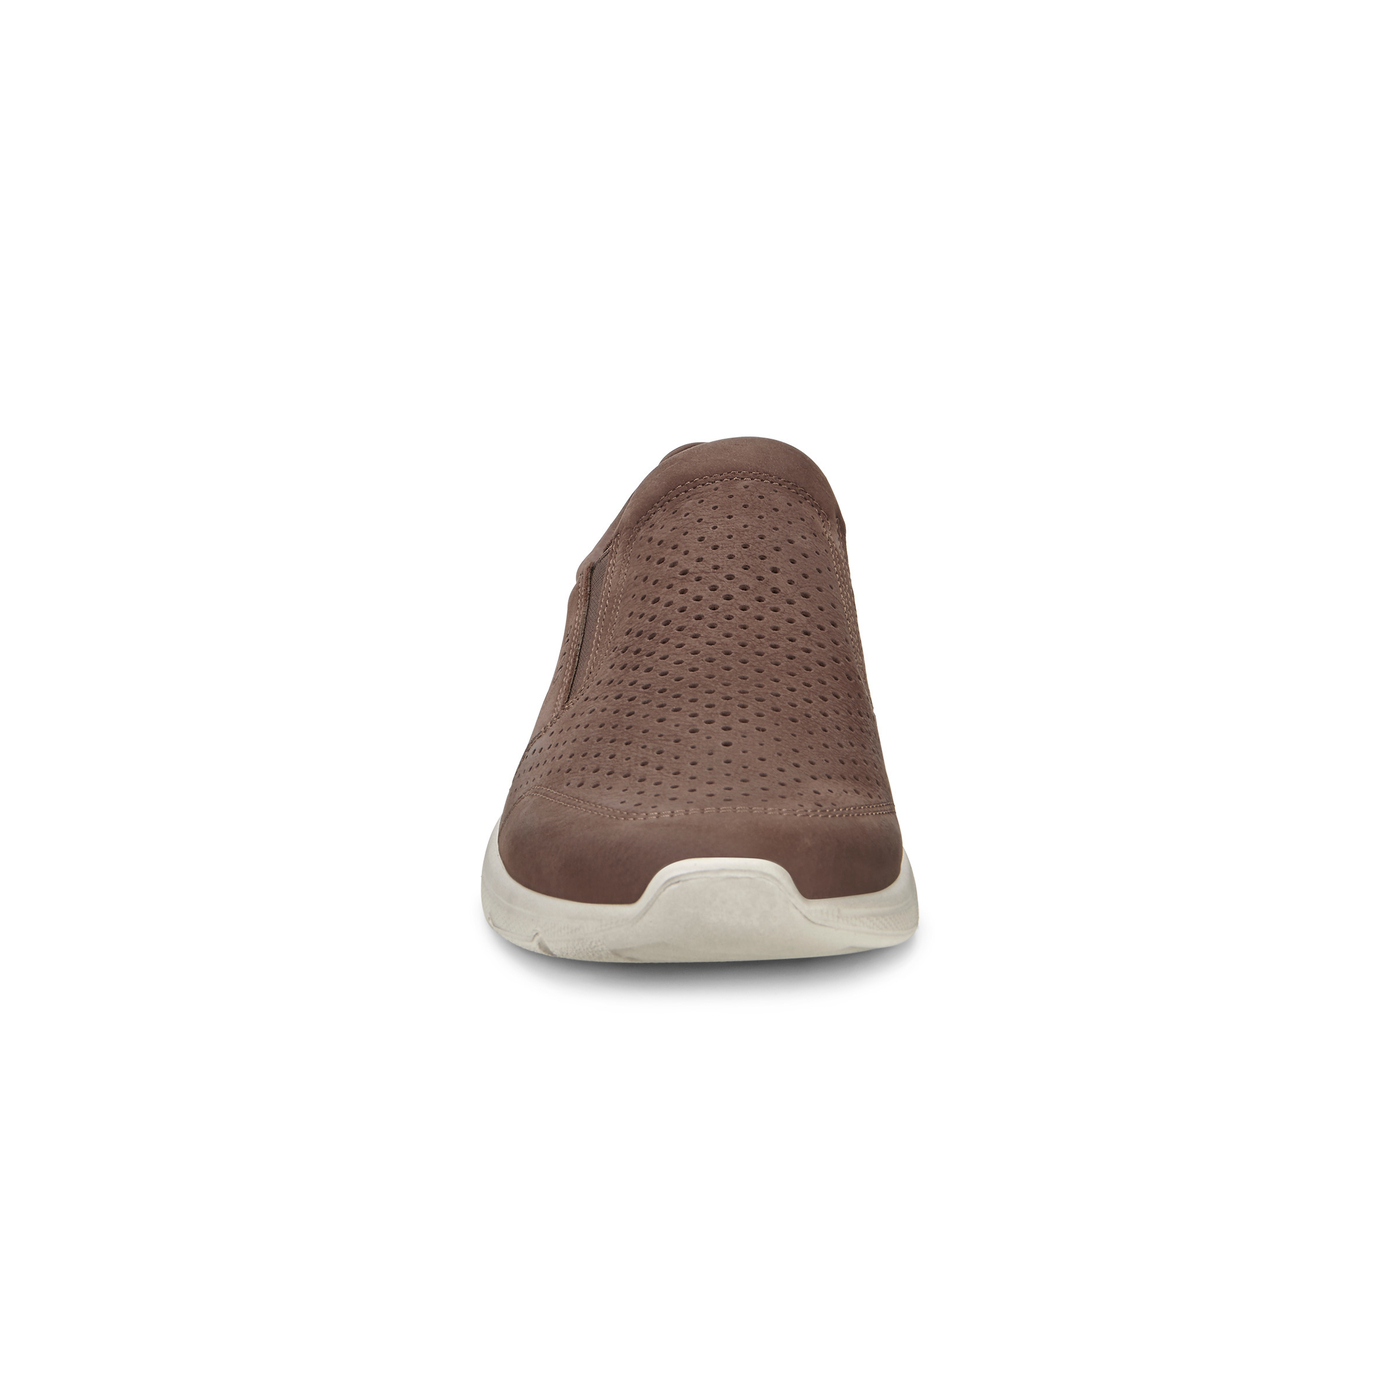 58fef7910e ECCO Men's Irving Casual Slip On | Casual Shoes | ECCO® Shoes